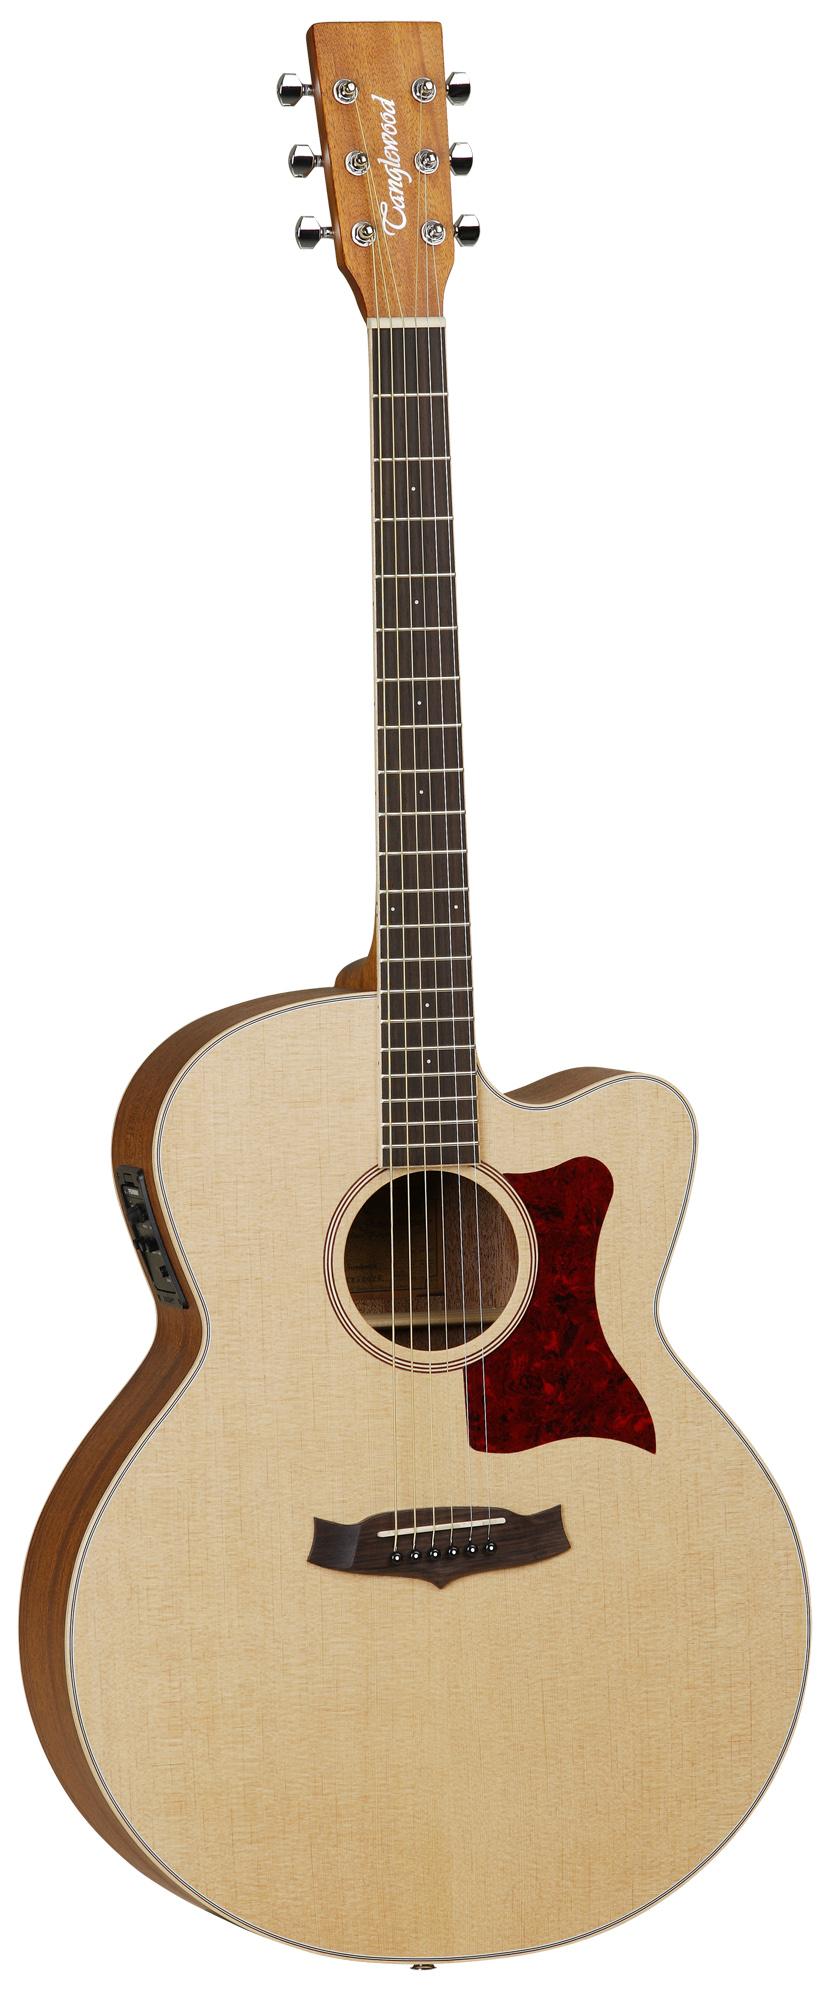 Tanglewood Sundance Super Jumbo Tw55 Ope Tanglewood Guitars